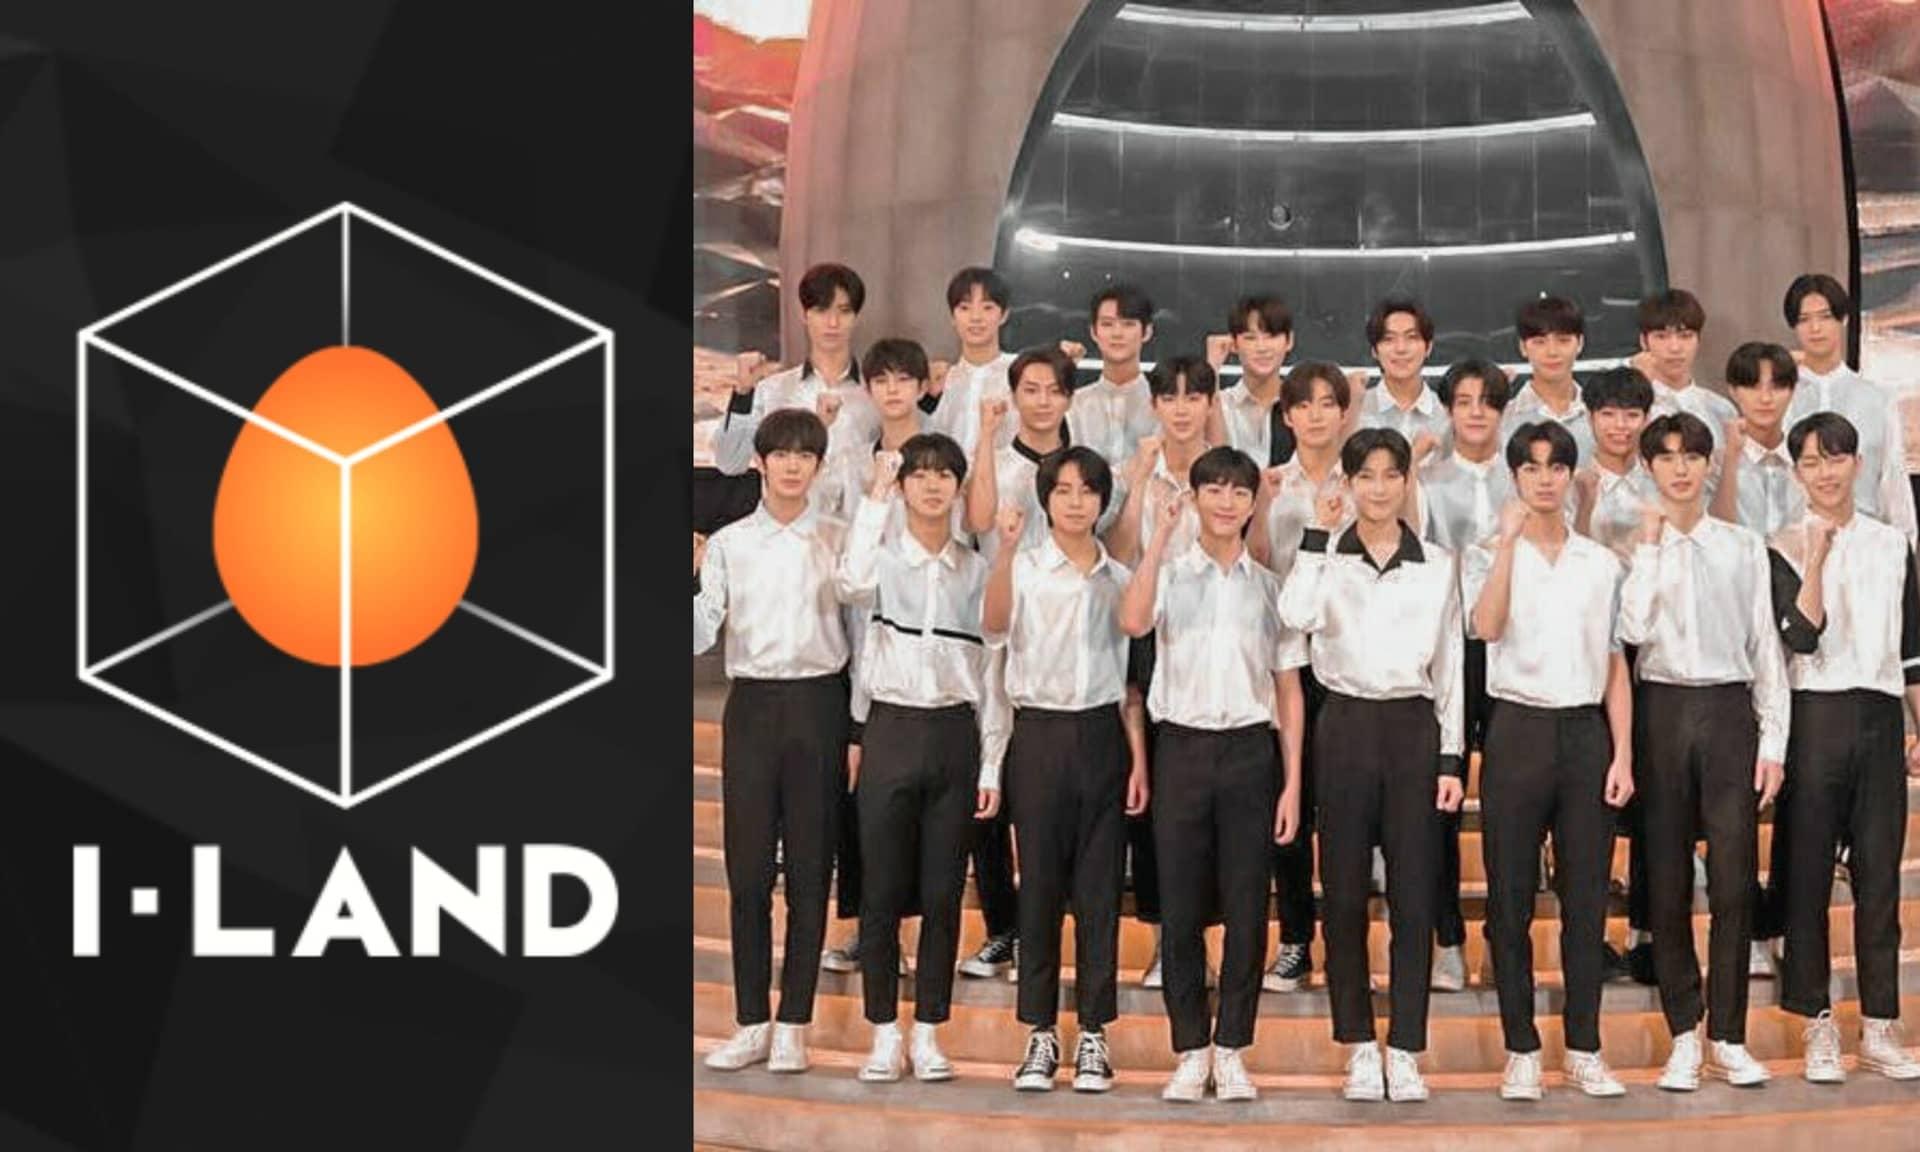 I-LAND – participantes, perfis, ranking final, vencedores, fatos e curiosidades